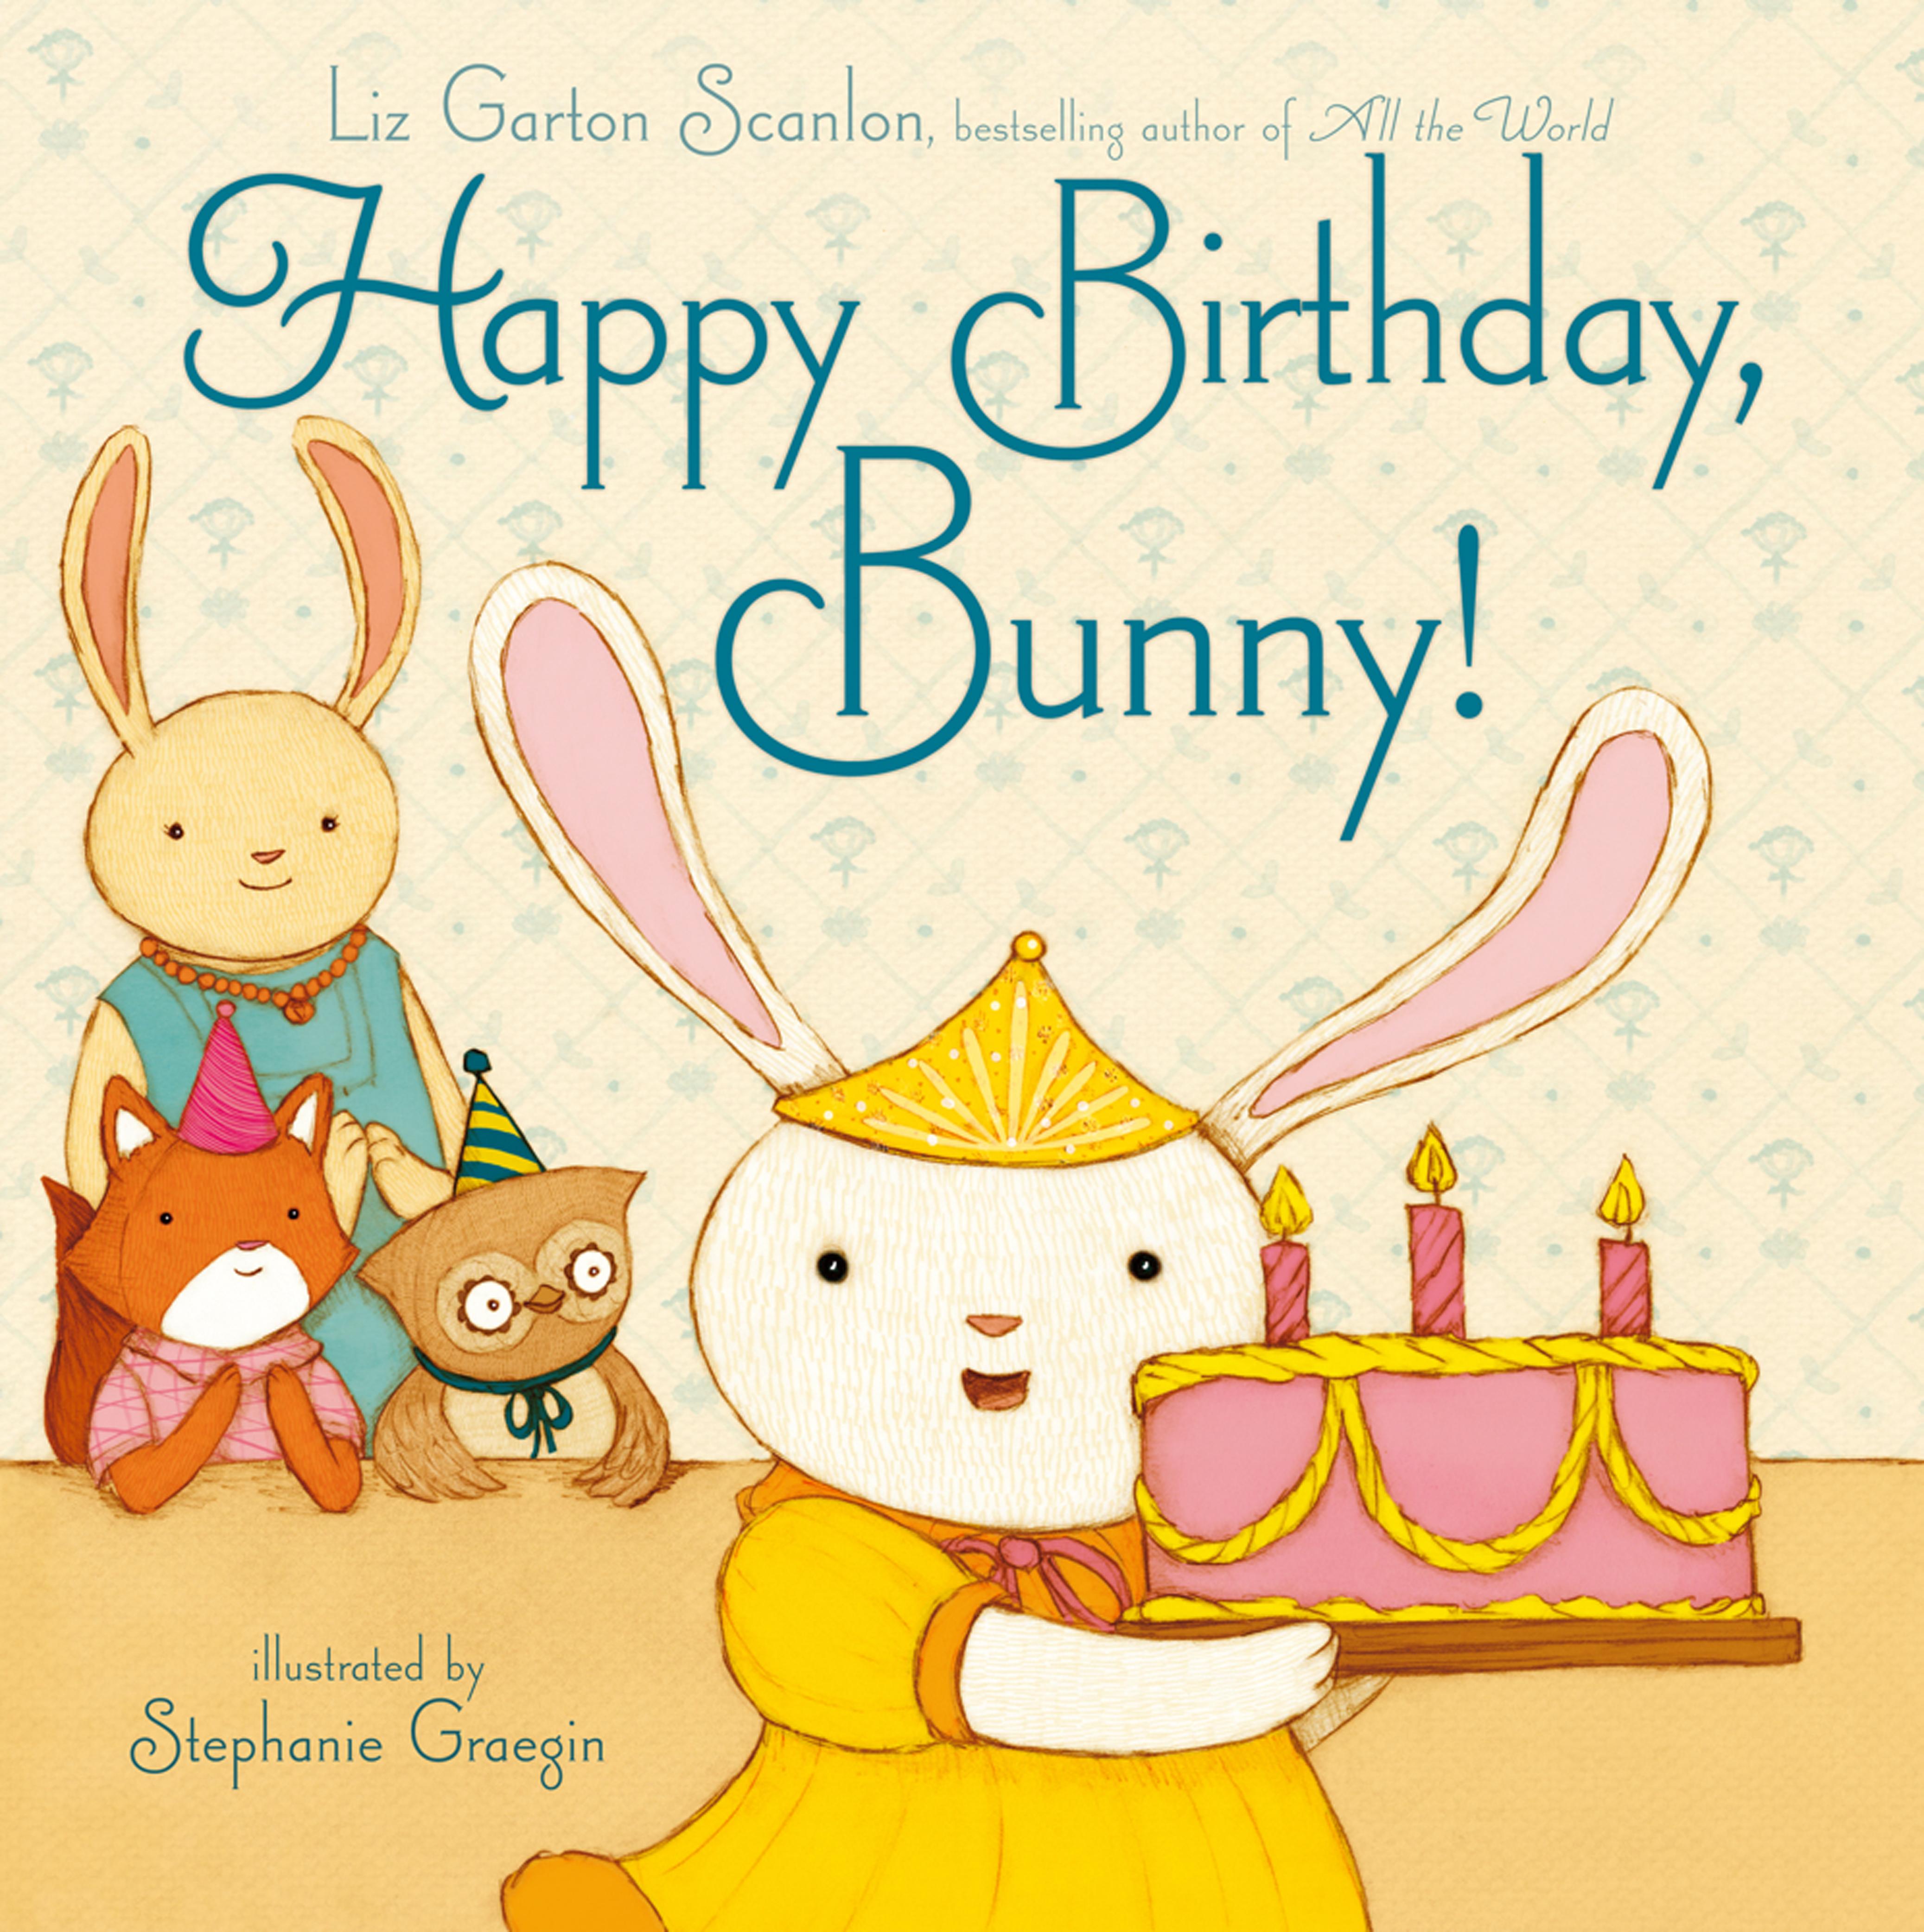 Happy Birthday, Bunny! | Book by Liz Garton Scanlon